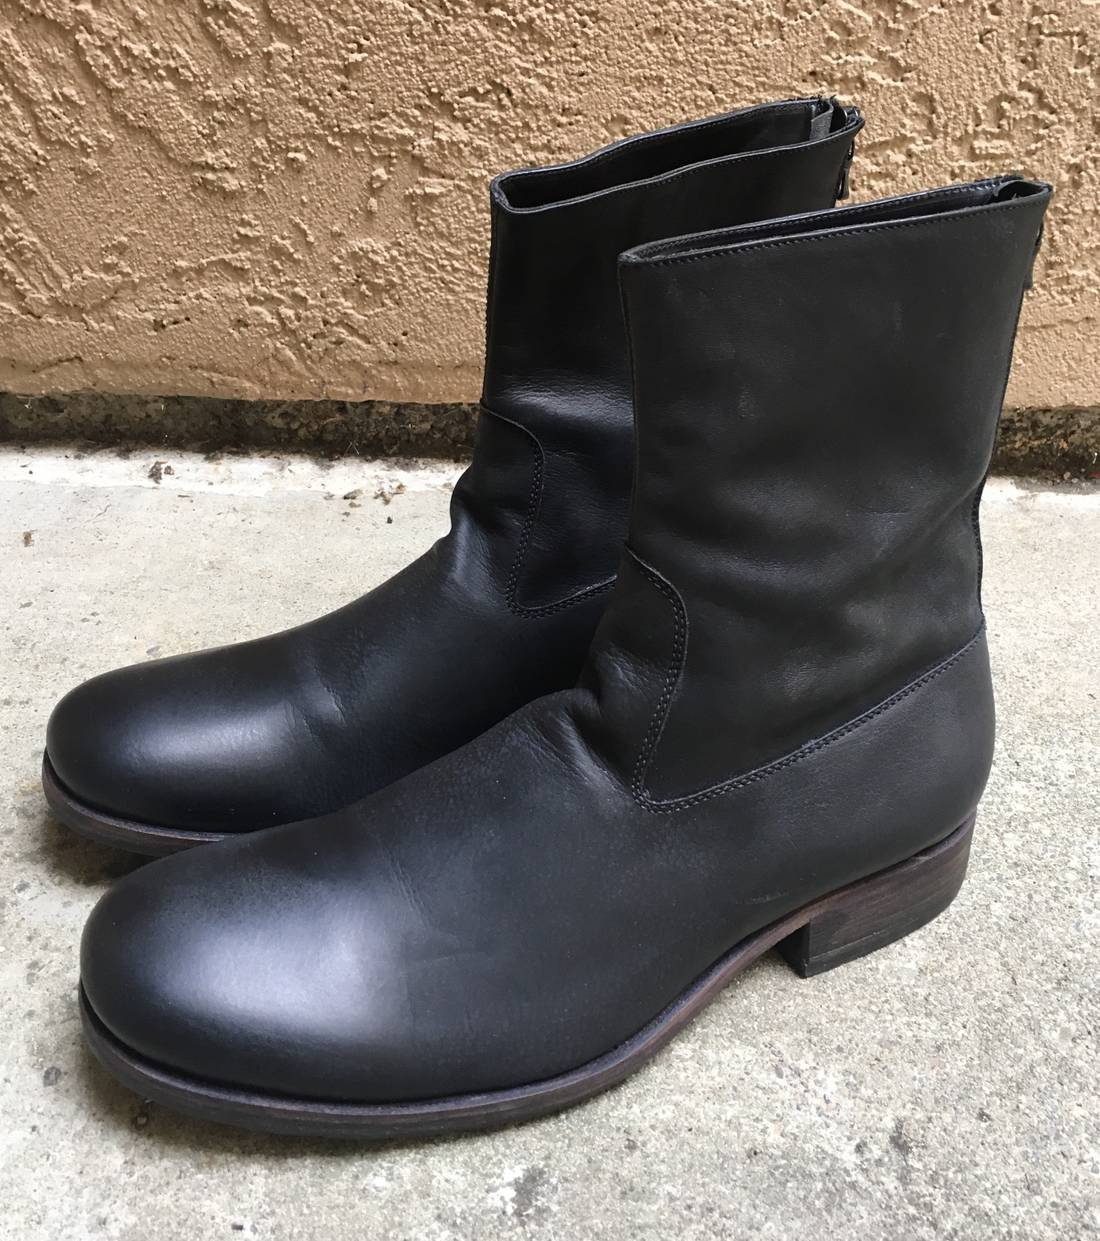 back zip boots - Black C Diem 0LPV0Q53R